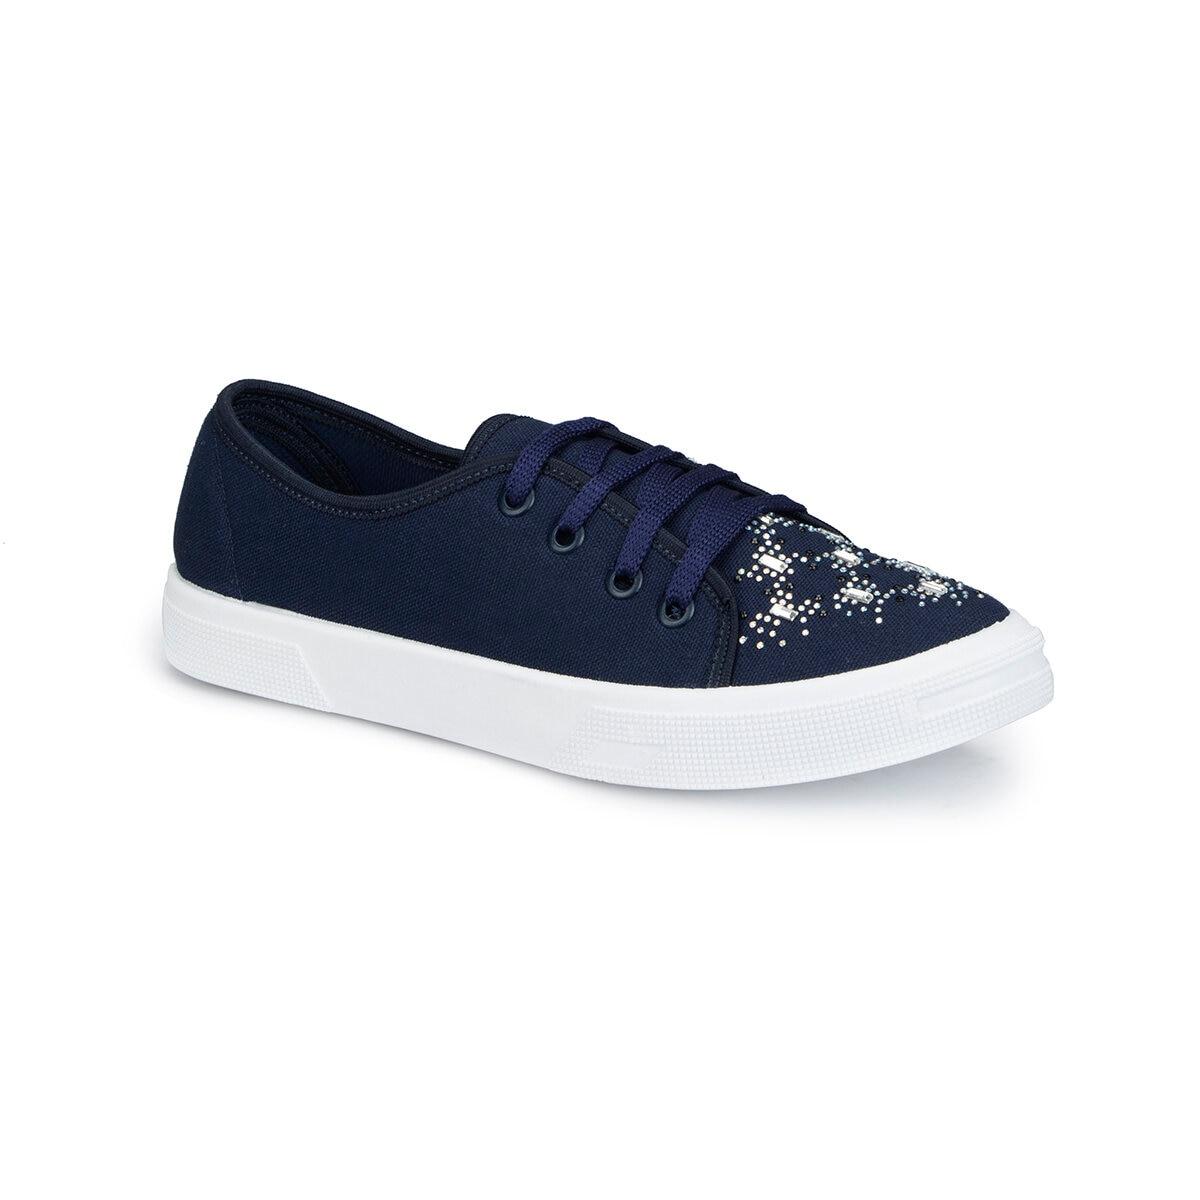 FLO 81. 311604.Z Navy Blue Women 'S Sneaker Shoes Polaris